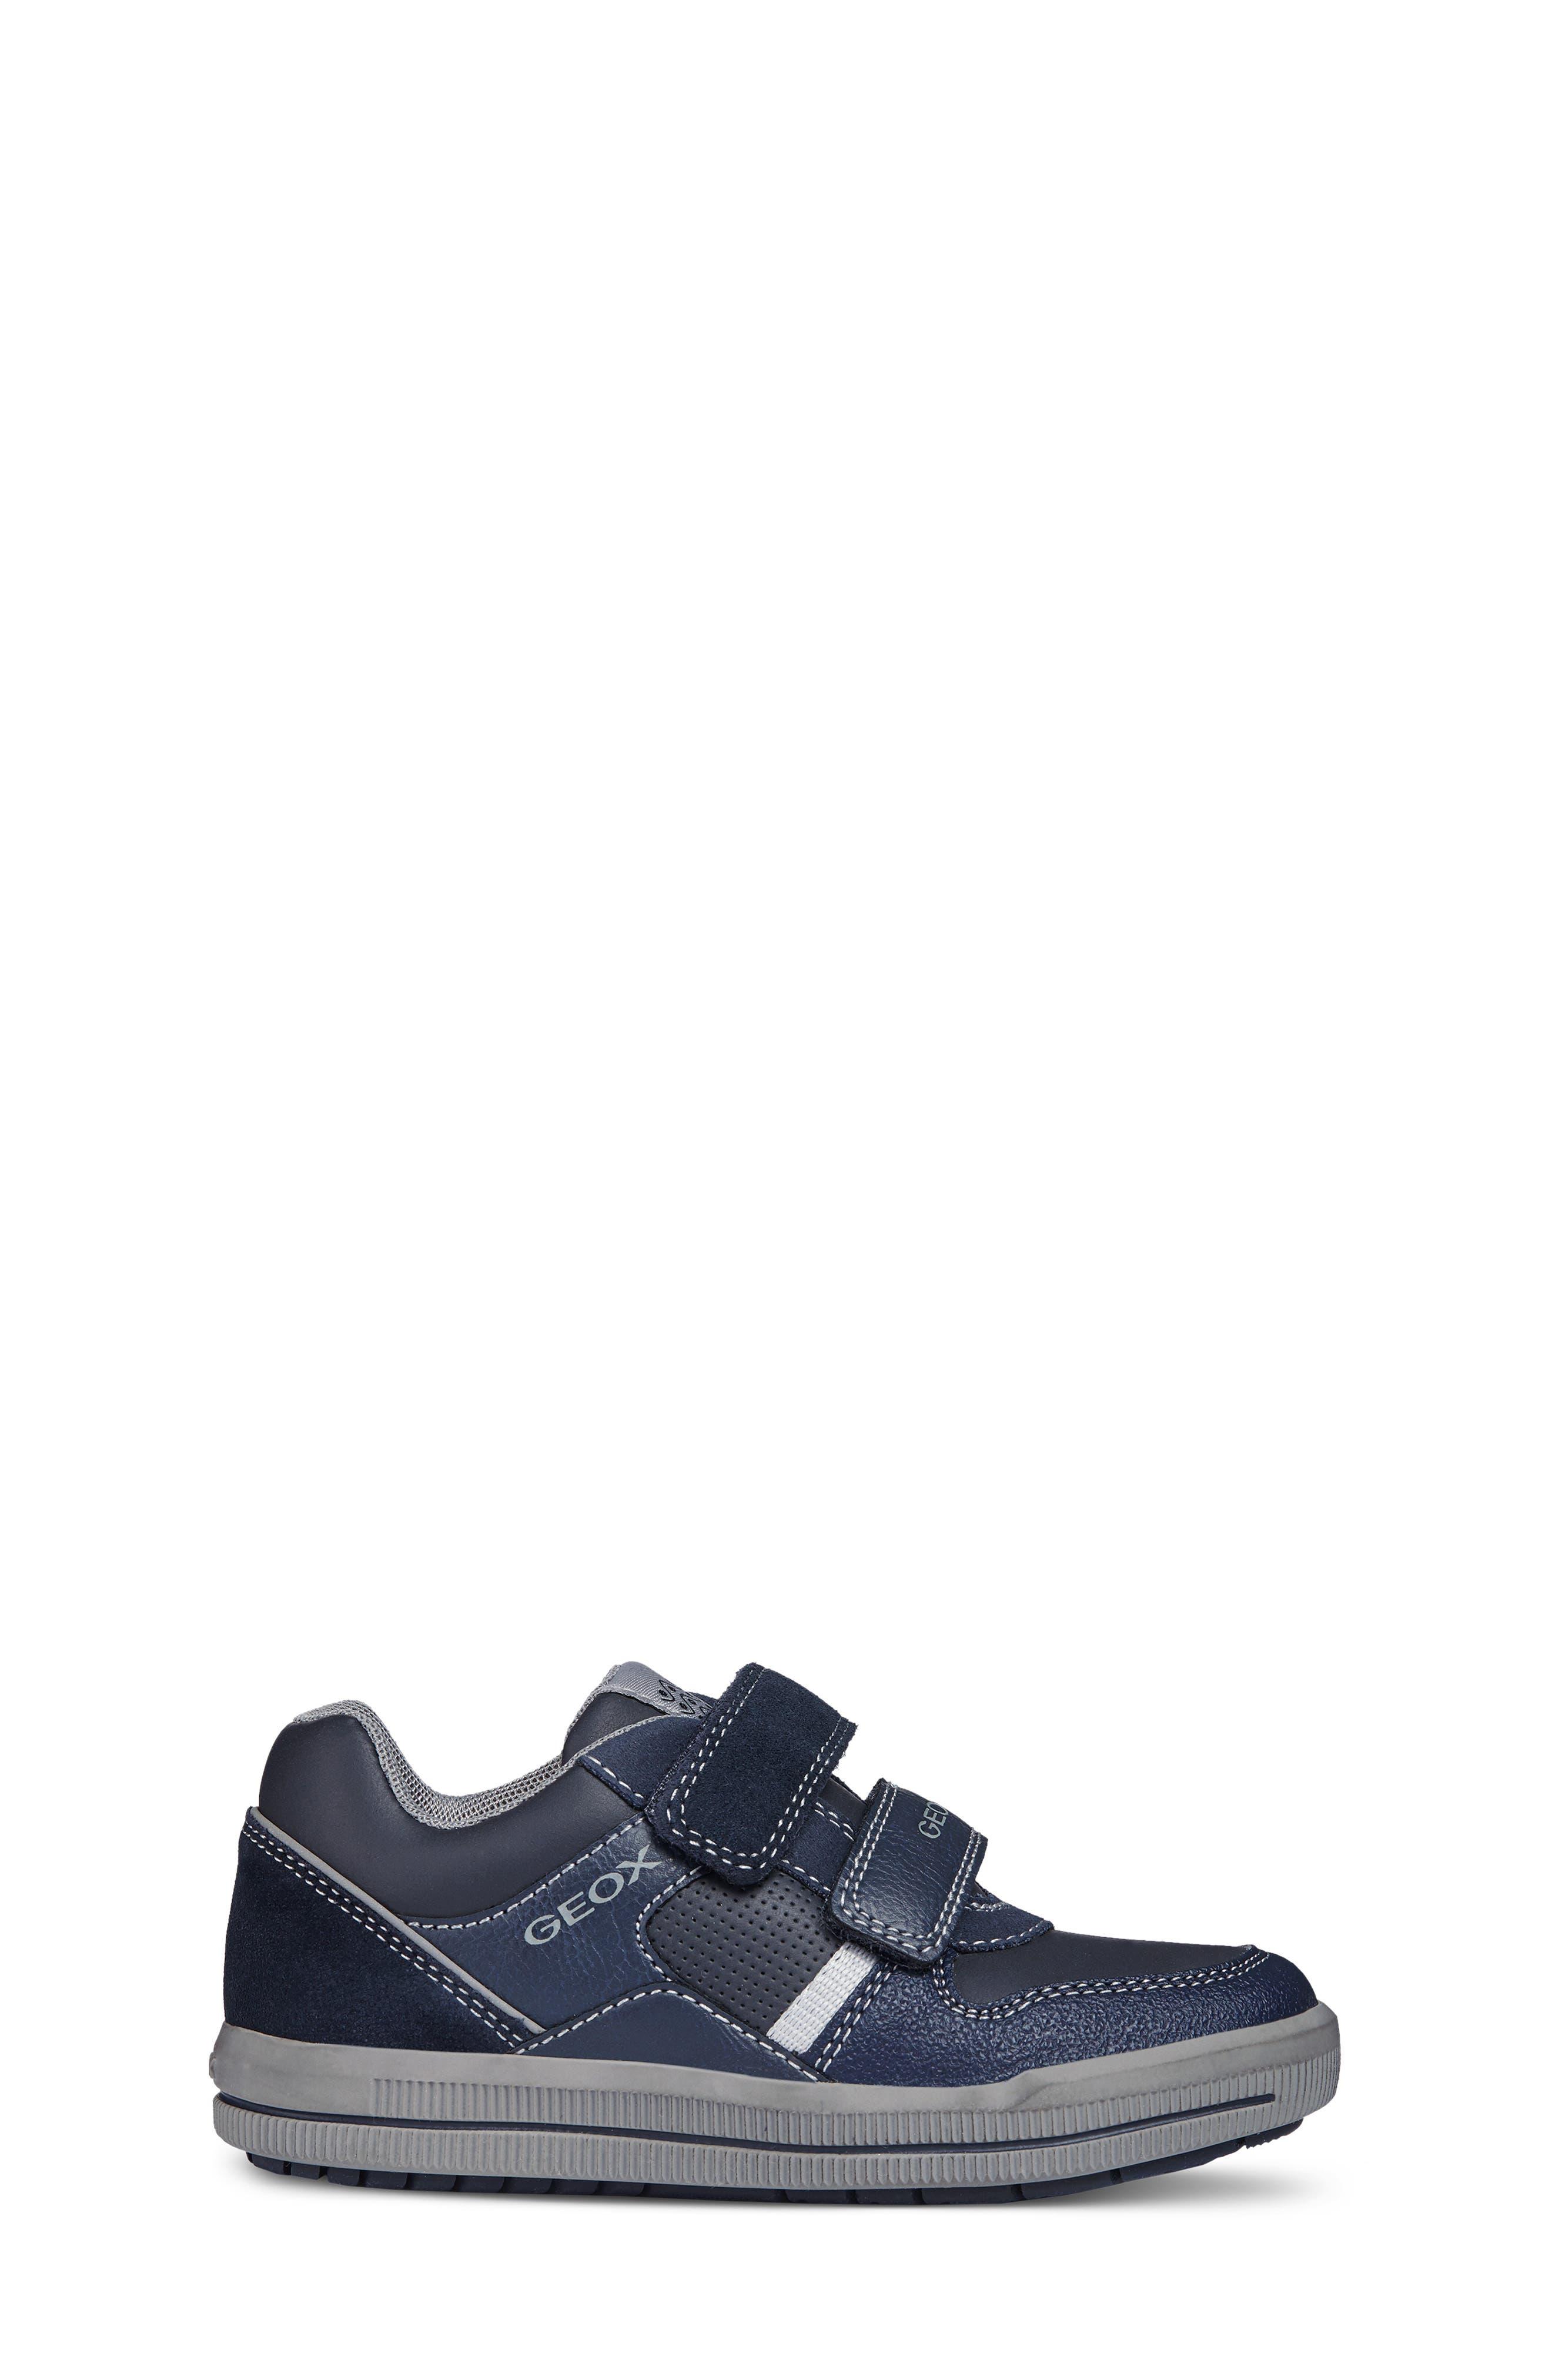 Jr Arzach Sneaker,                             Alternate thumbnail 3, color,                             Navy Blue/ Grey